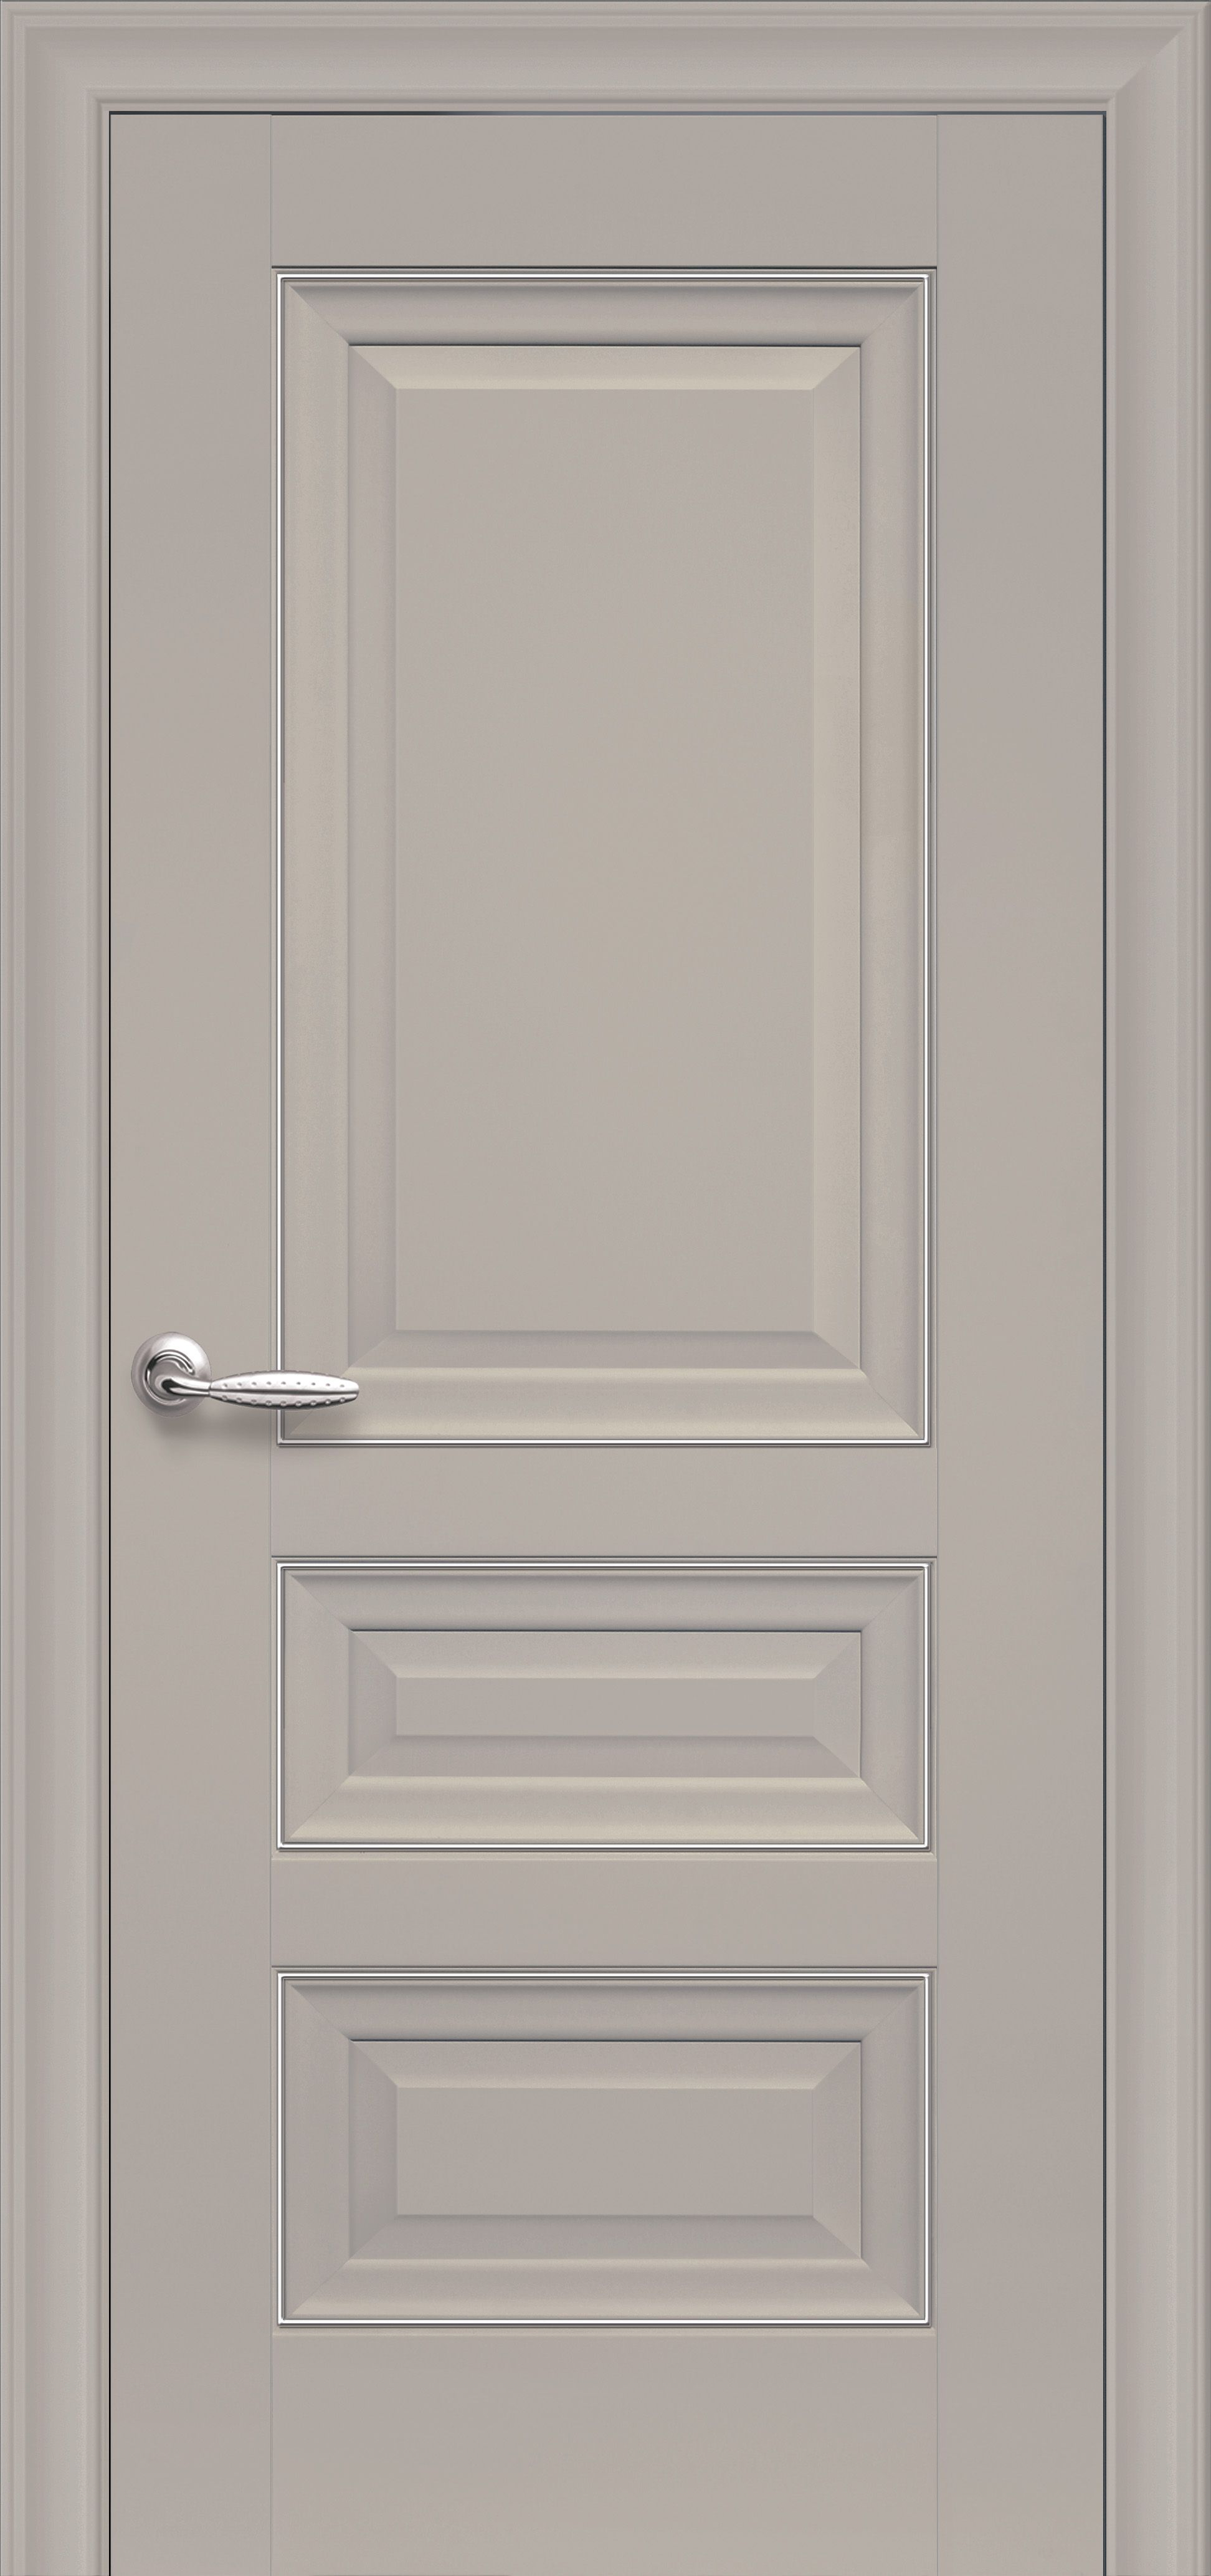 Межкомнатные двери Статус Глухое с молдингом